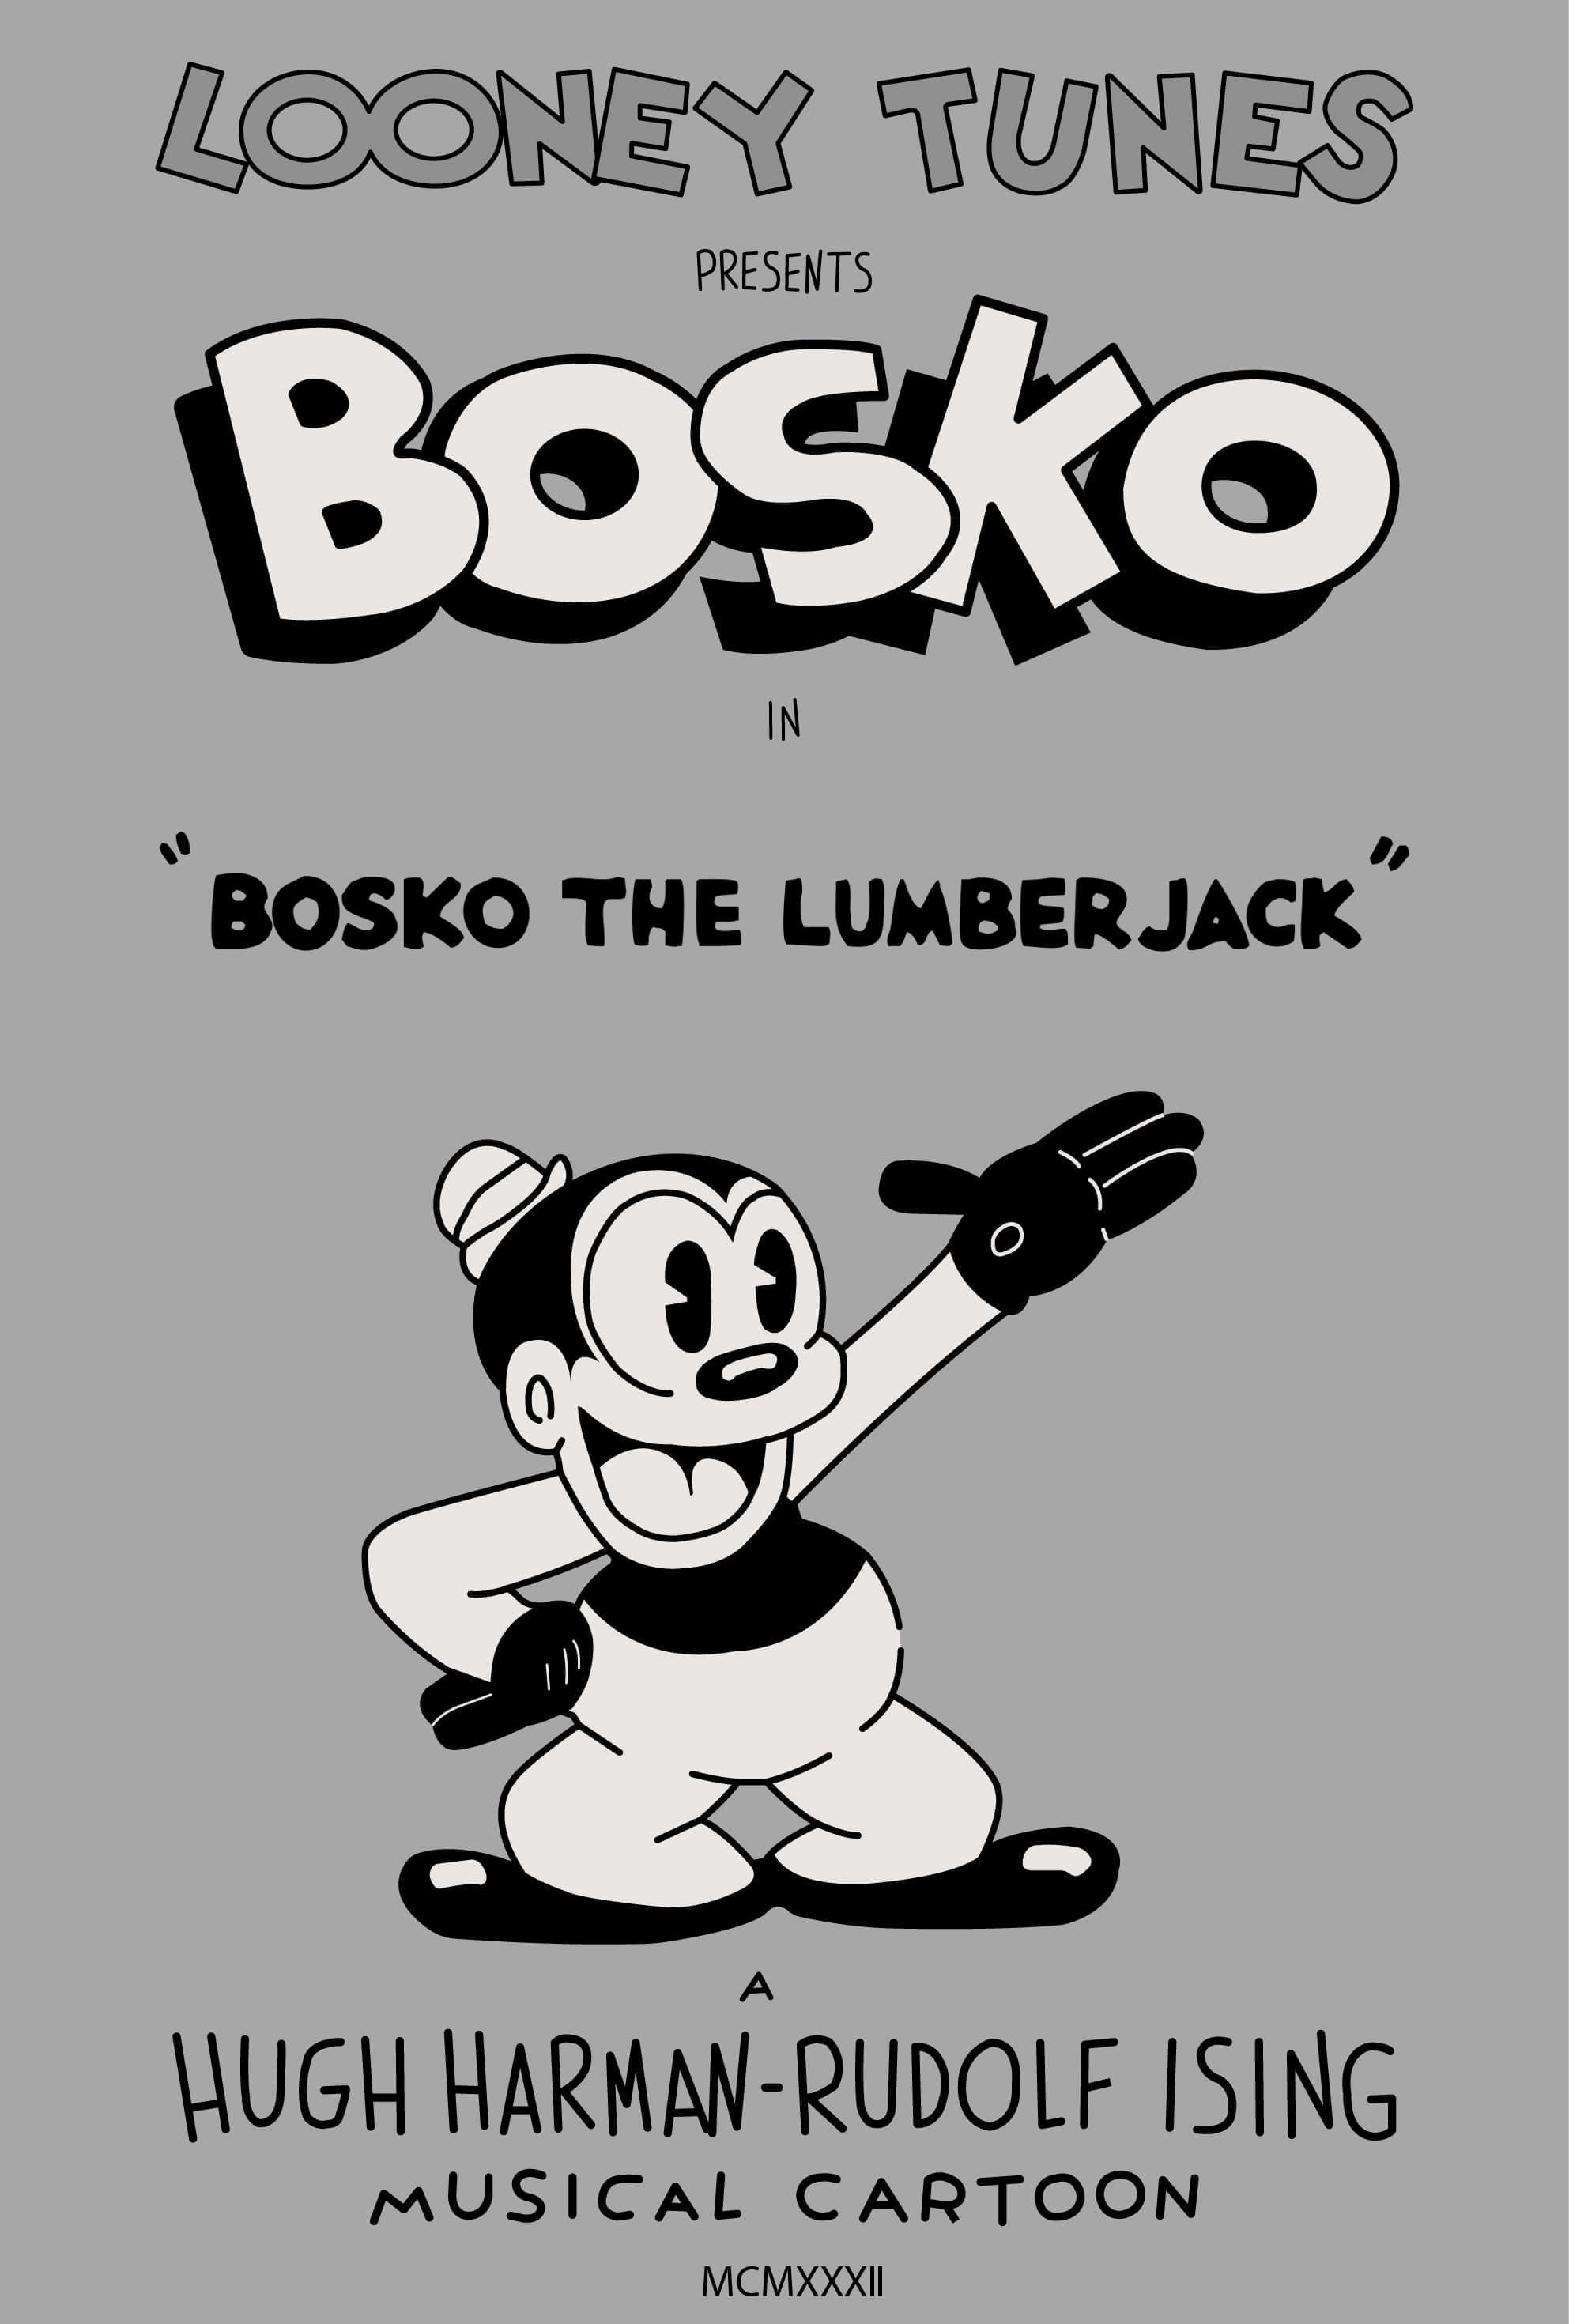 Bosko the Lumberjack